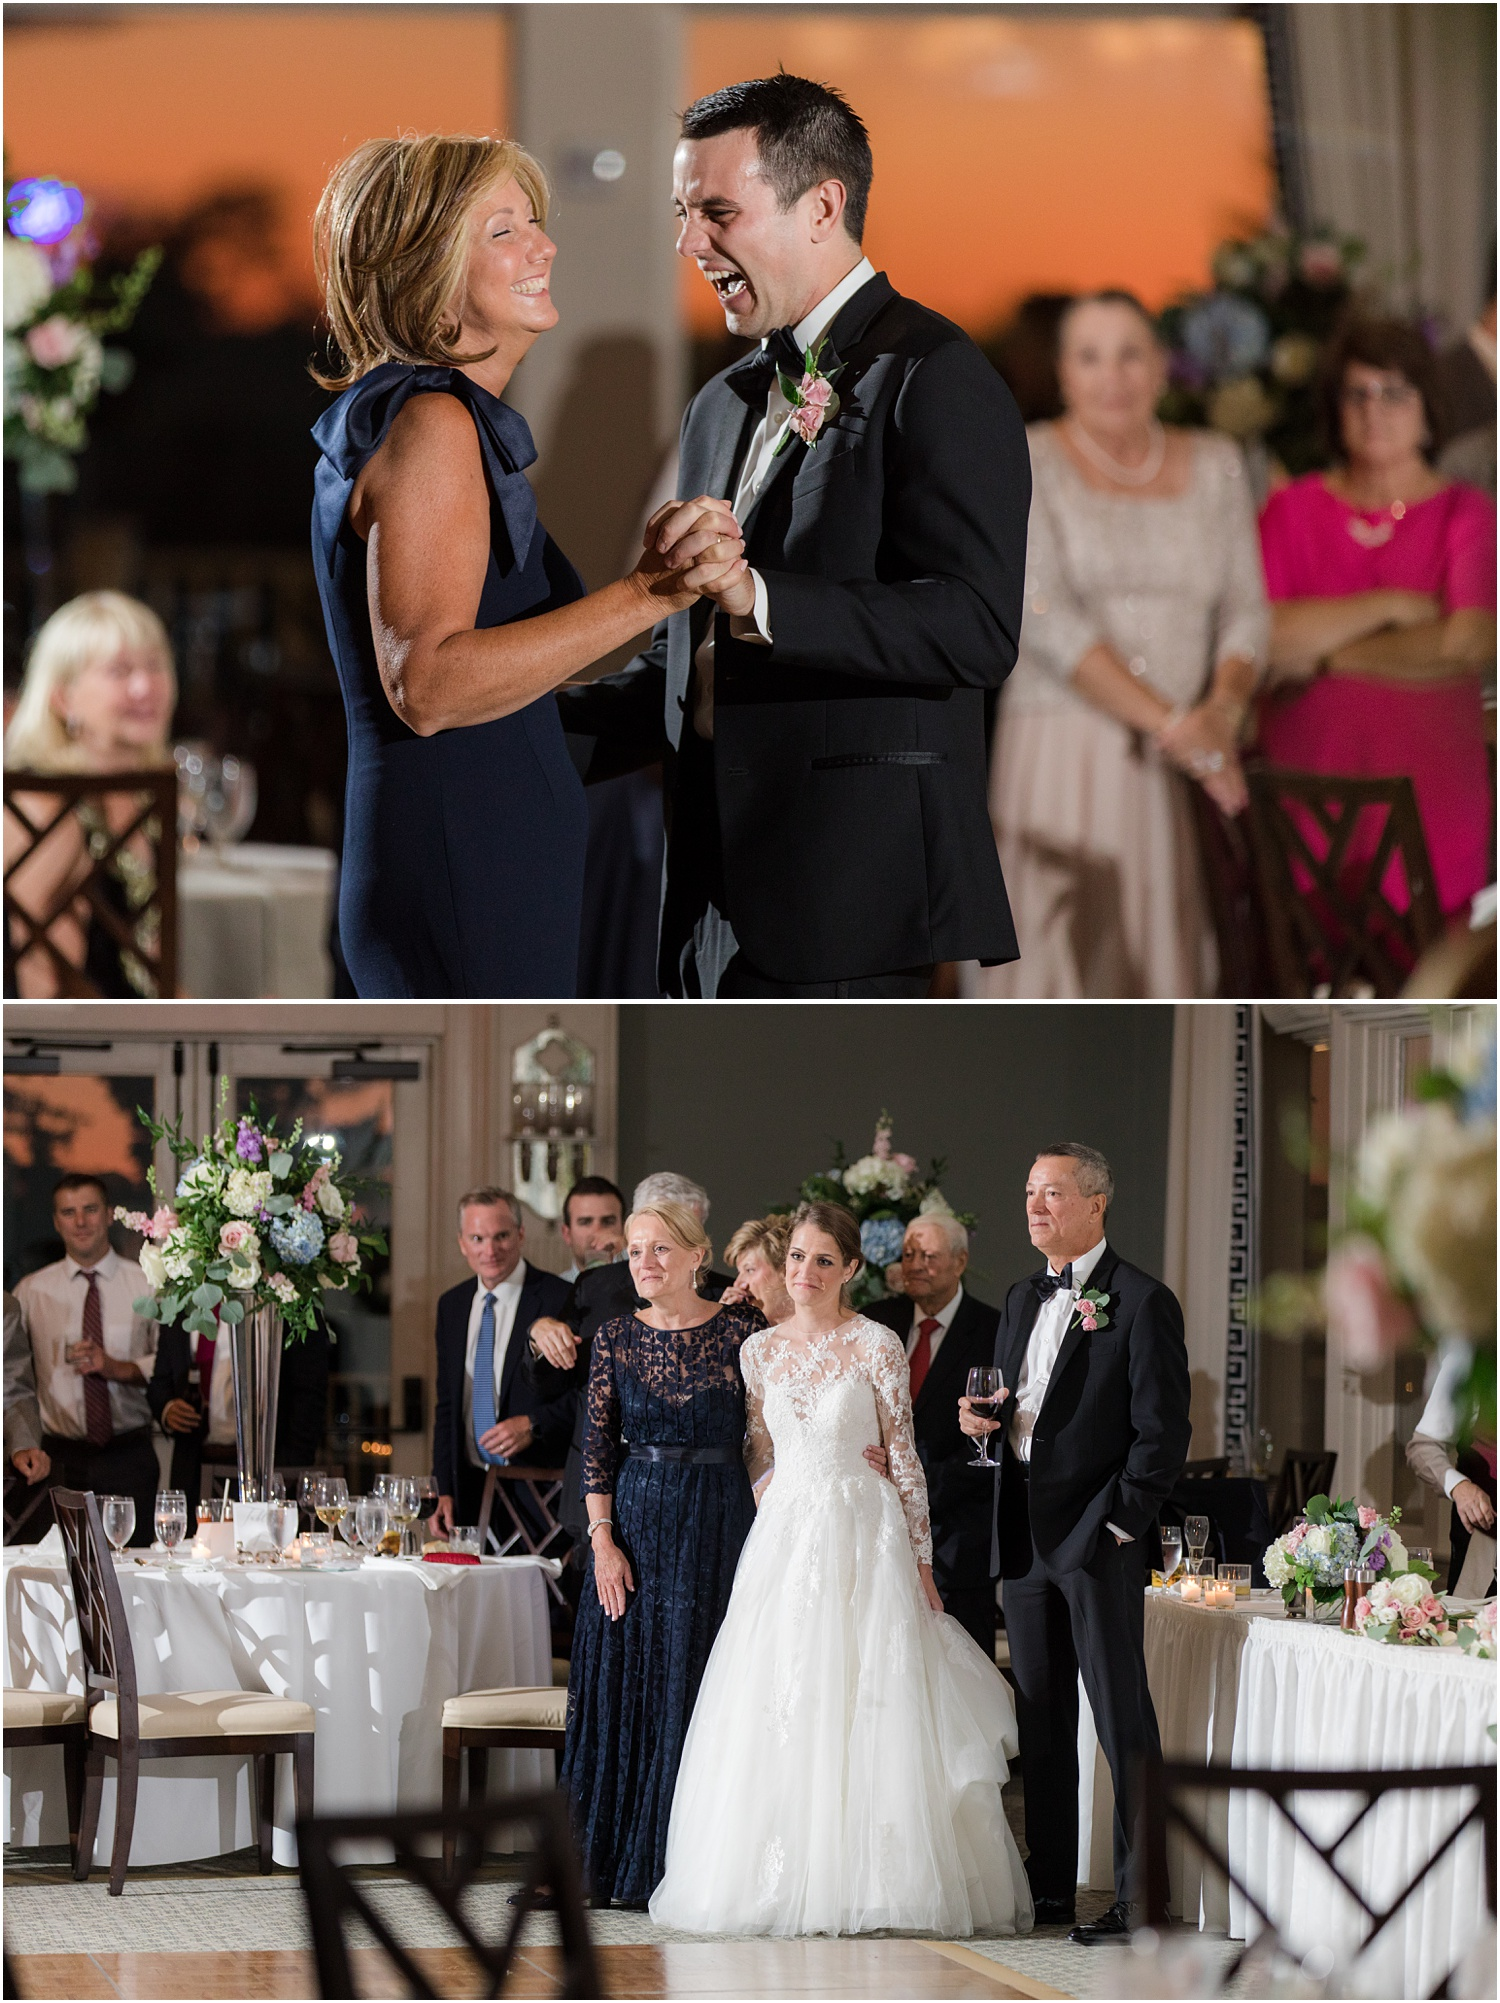 parent dances at Canoe brook country club wedding reception.